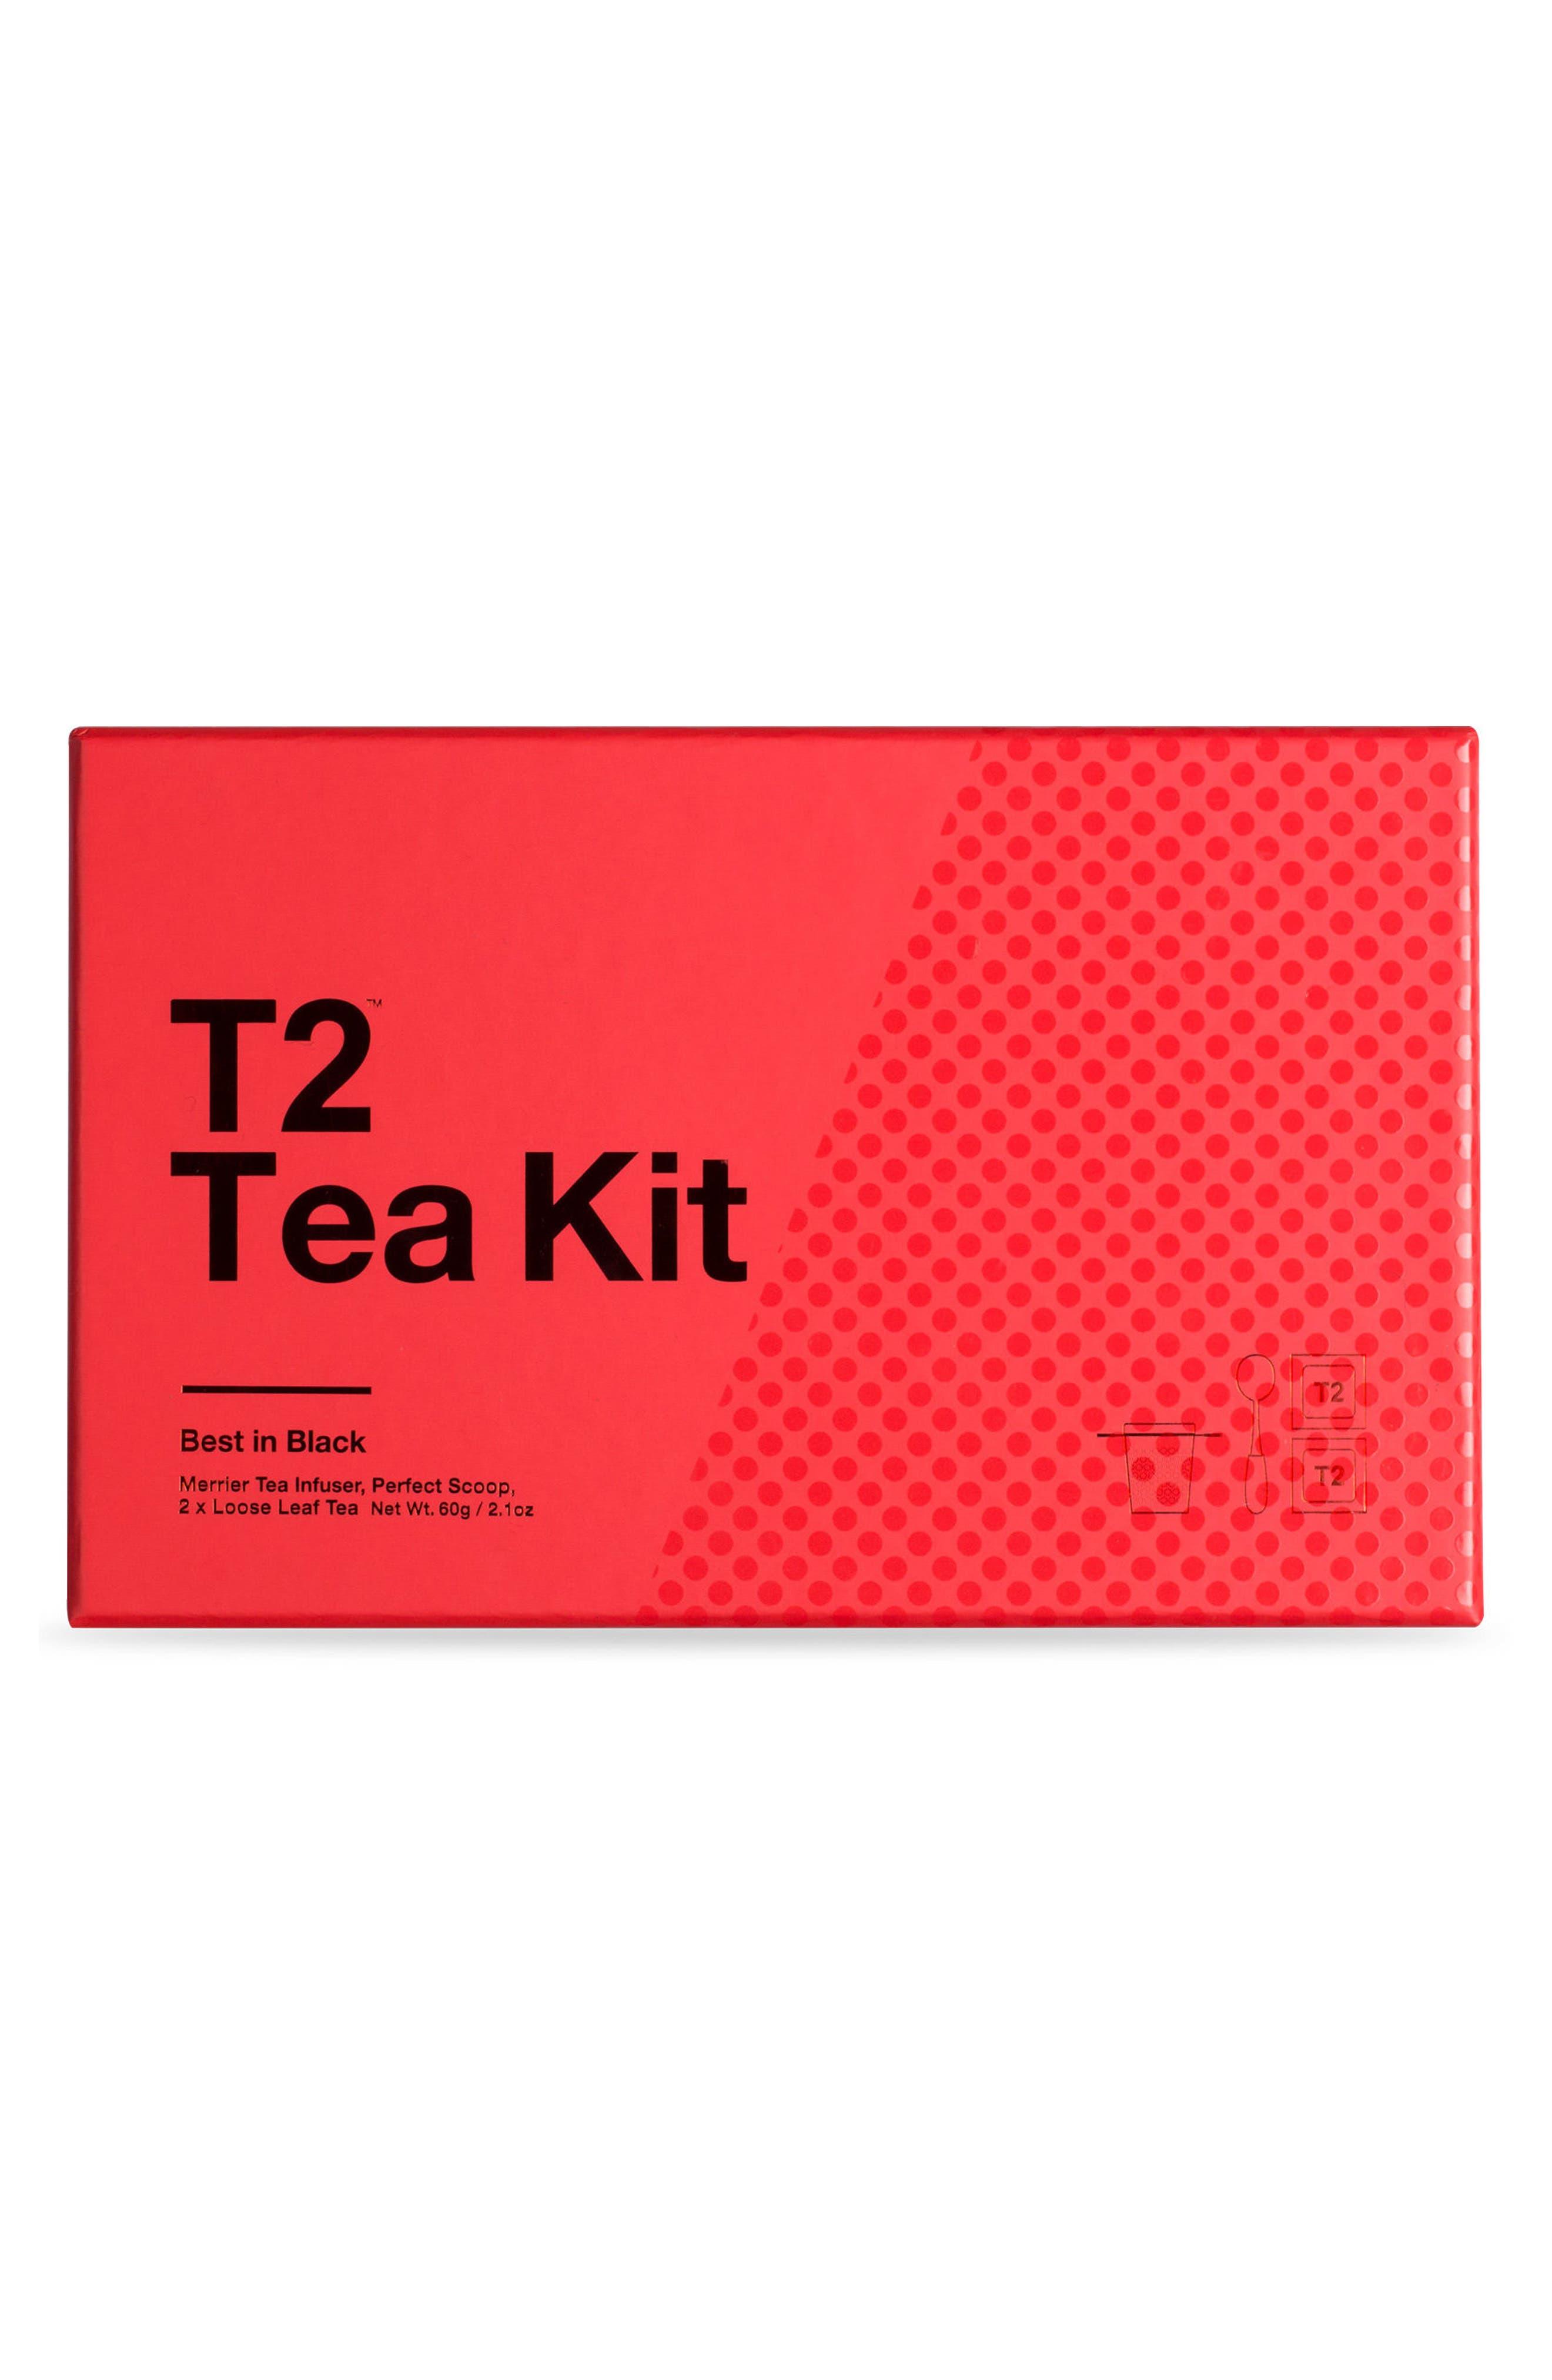 Best in Black Loose Leaf Tea Box Set,                             Main thumbnail 1, color,                             Multi